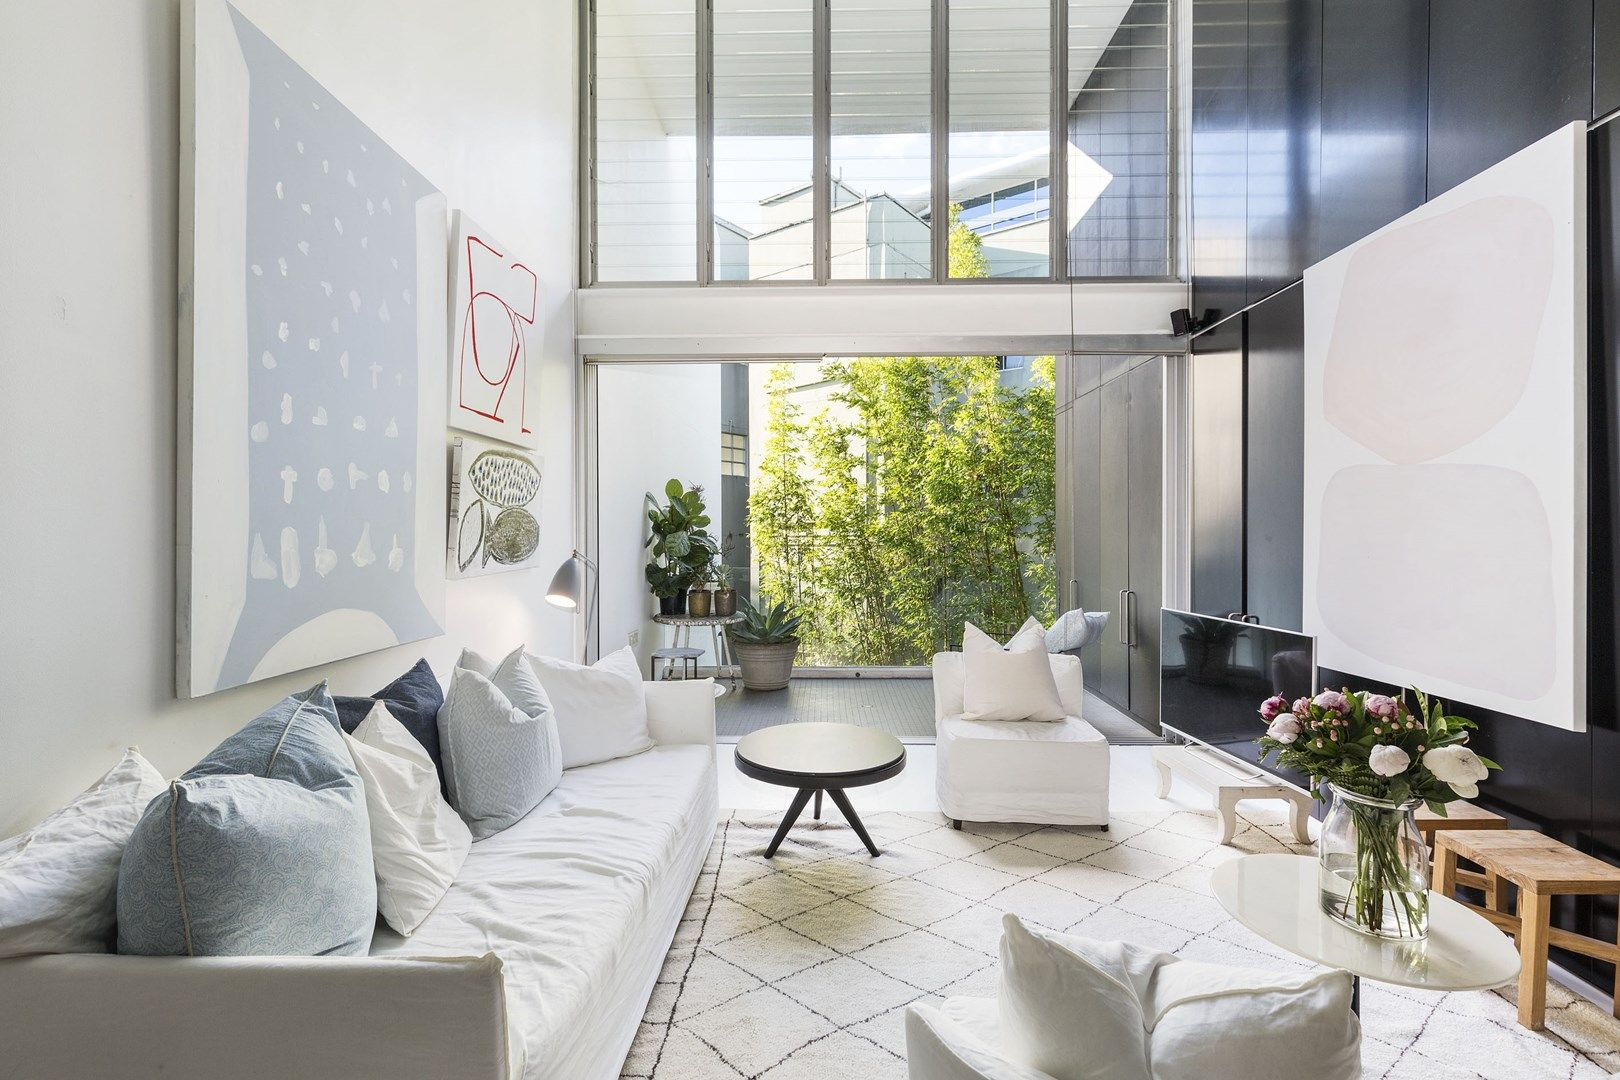 Modern Gezellig Interieur : Dit moderne speelse appartement is super mooi en sfeervol